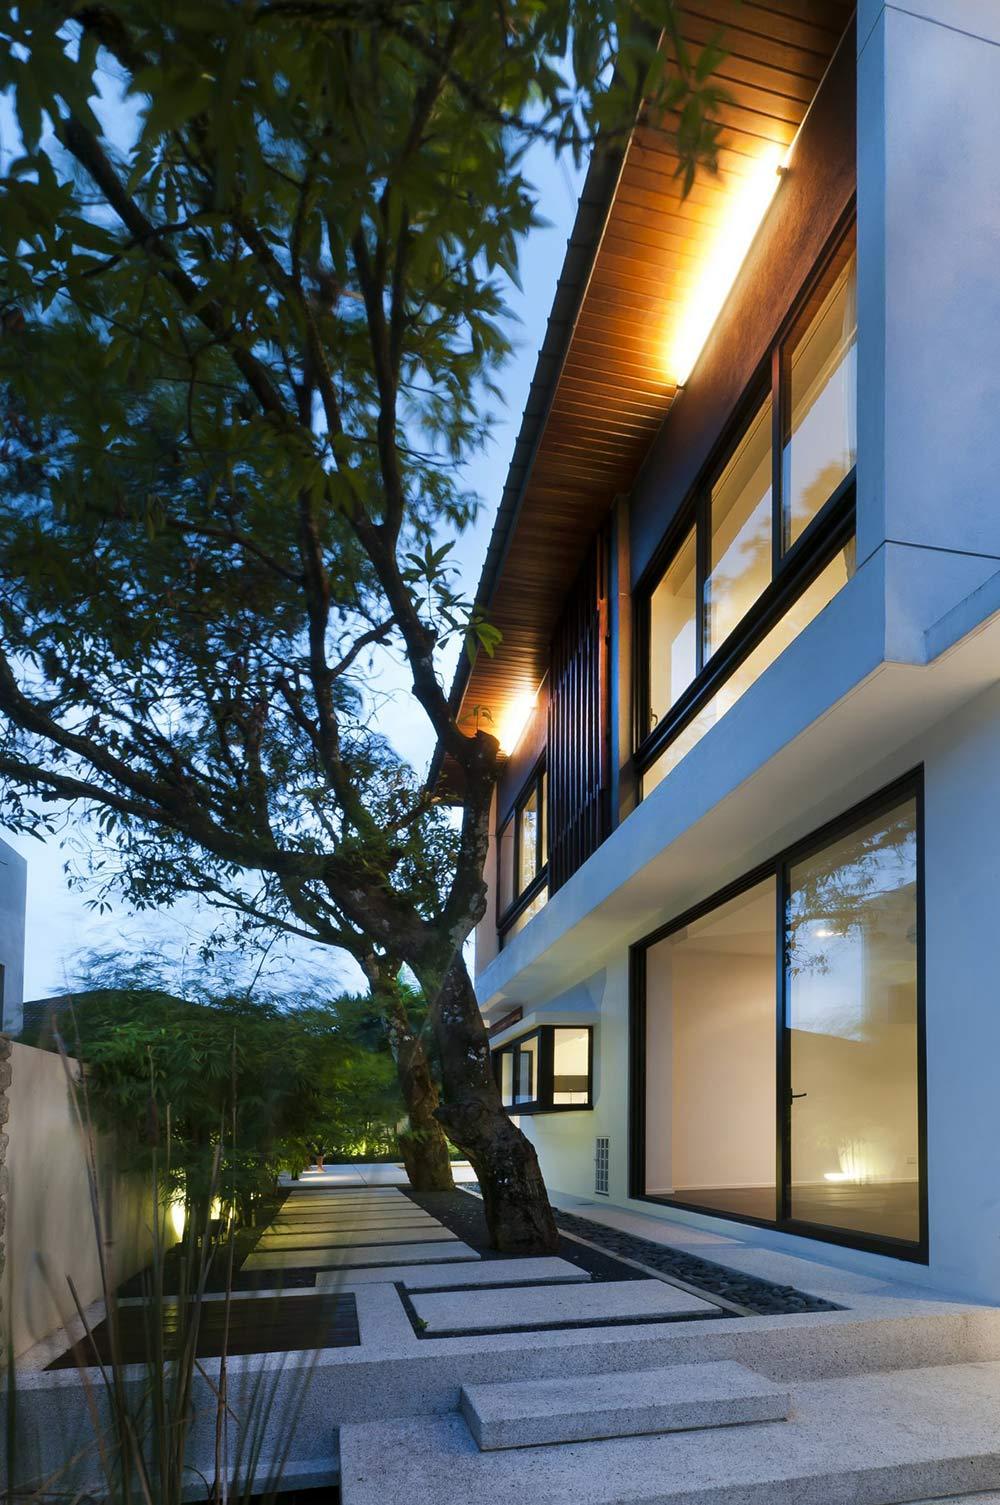 Patio Door, Stone Terrace, Modern Home in Kuala Lumpur